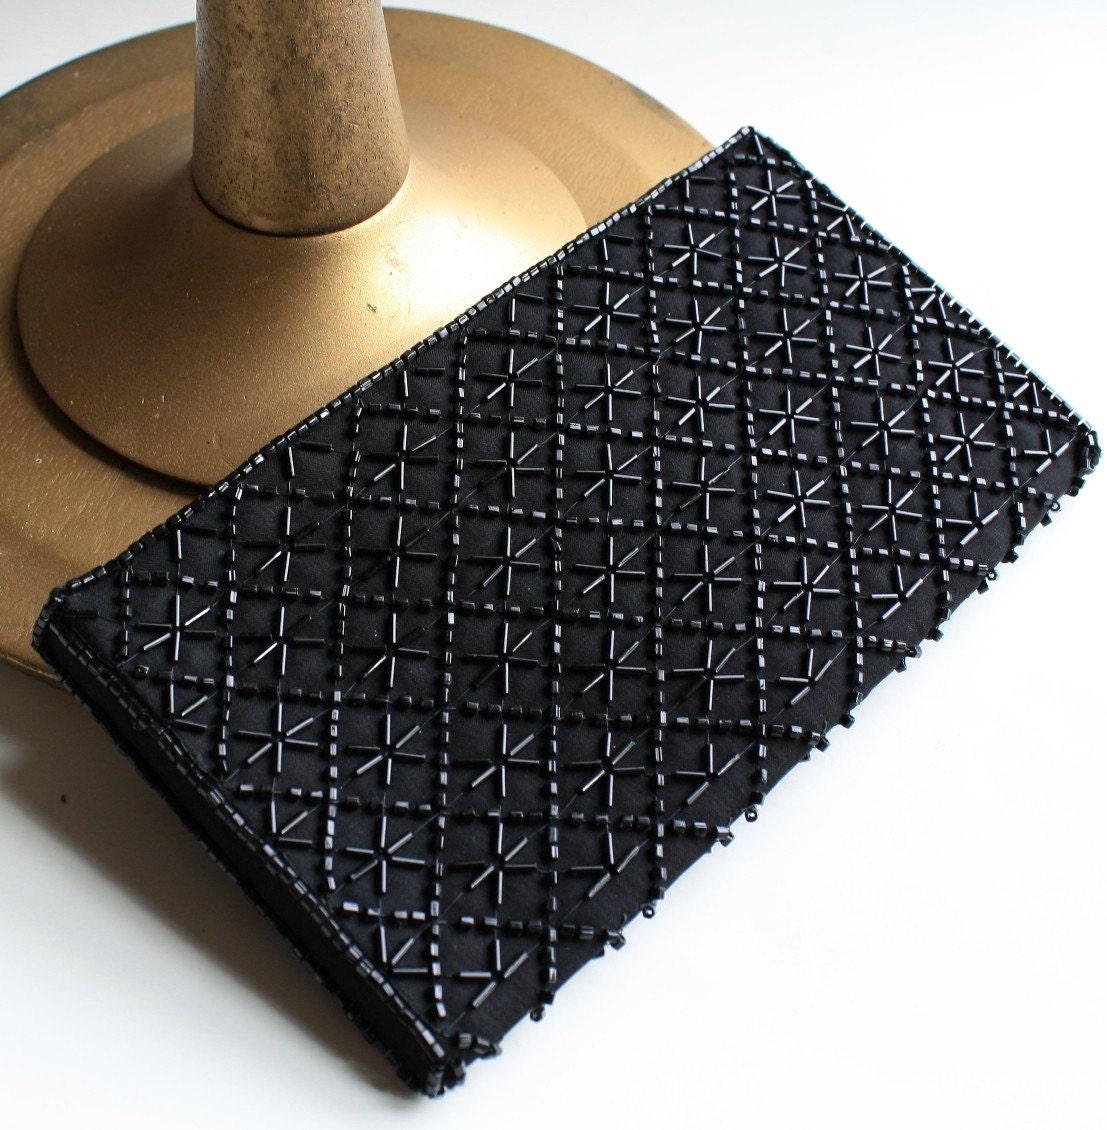 black beaded clutch. vintage La Regale lack beaded